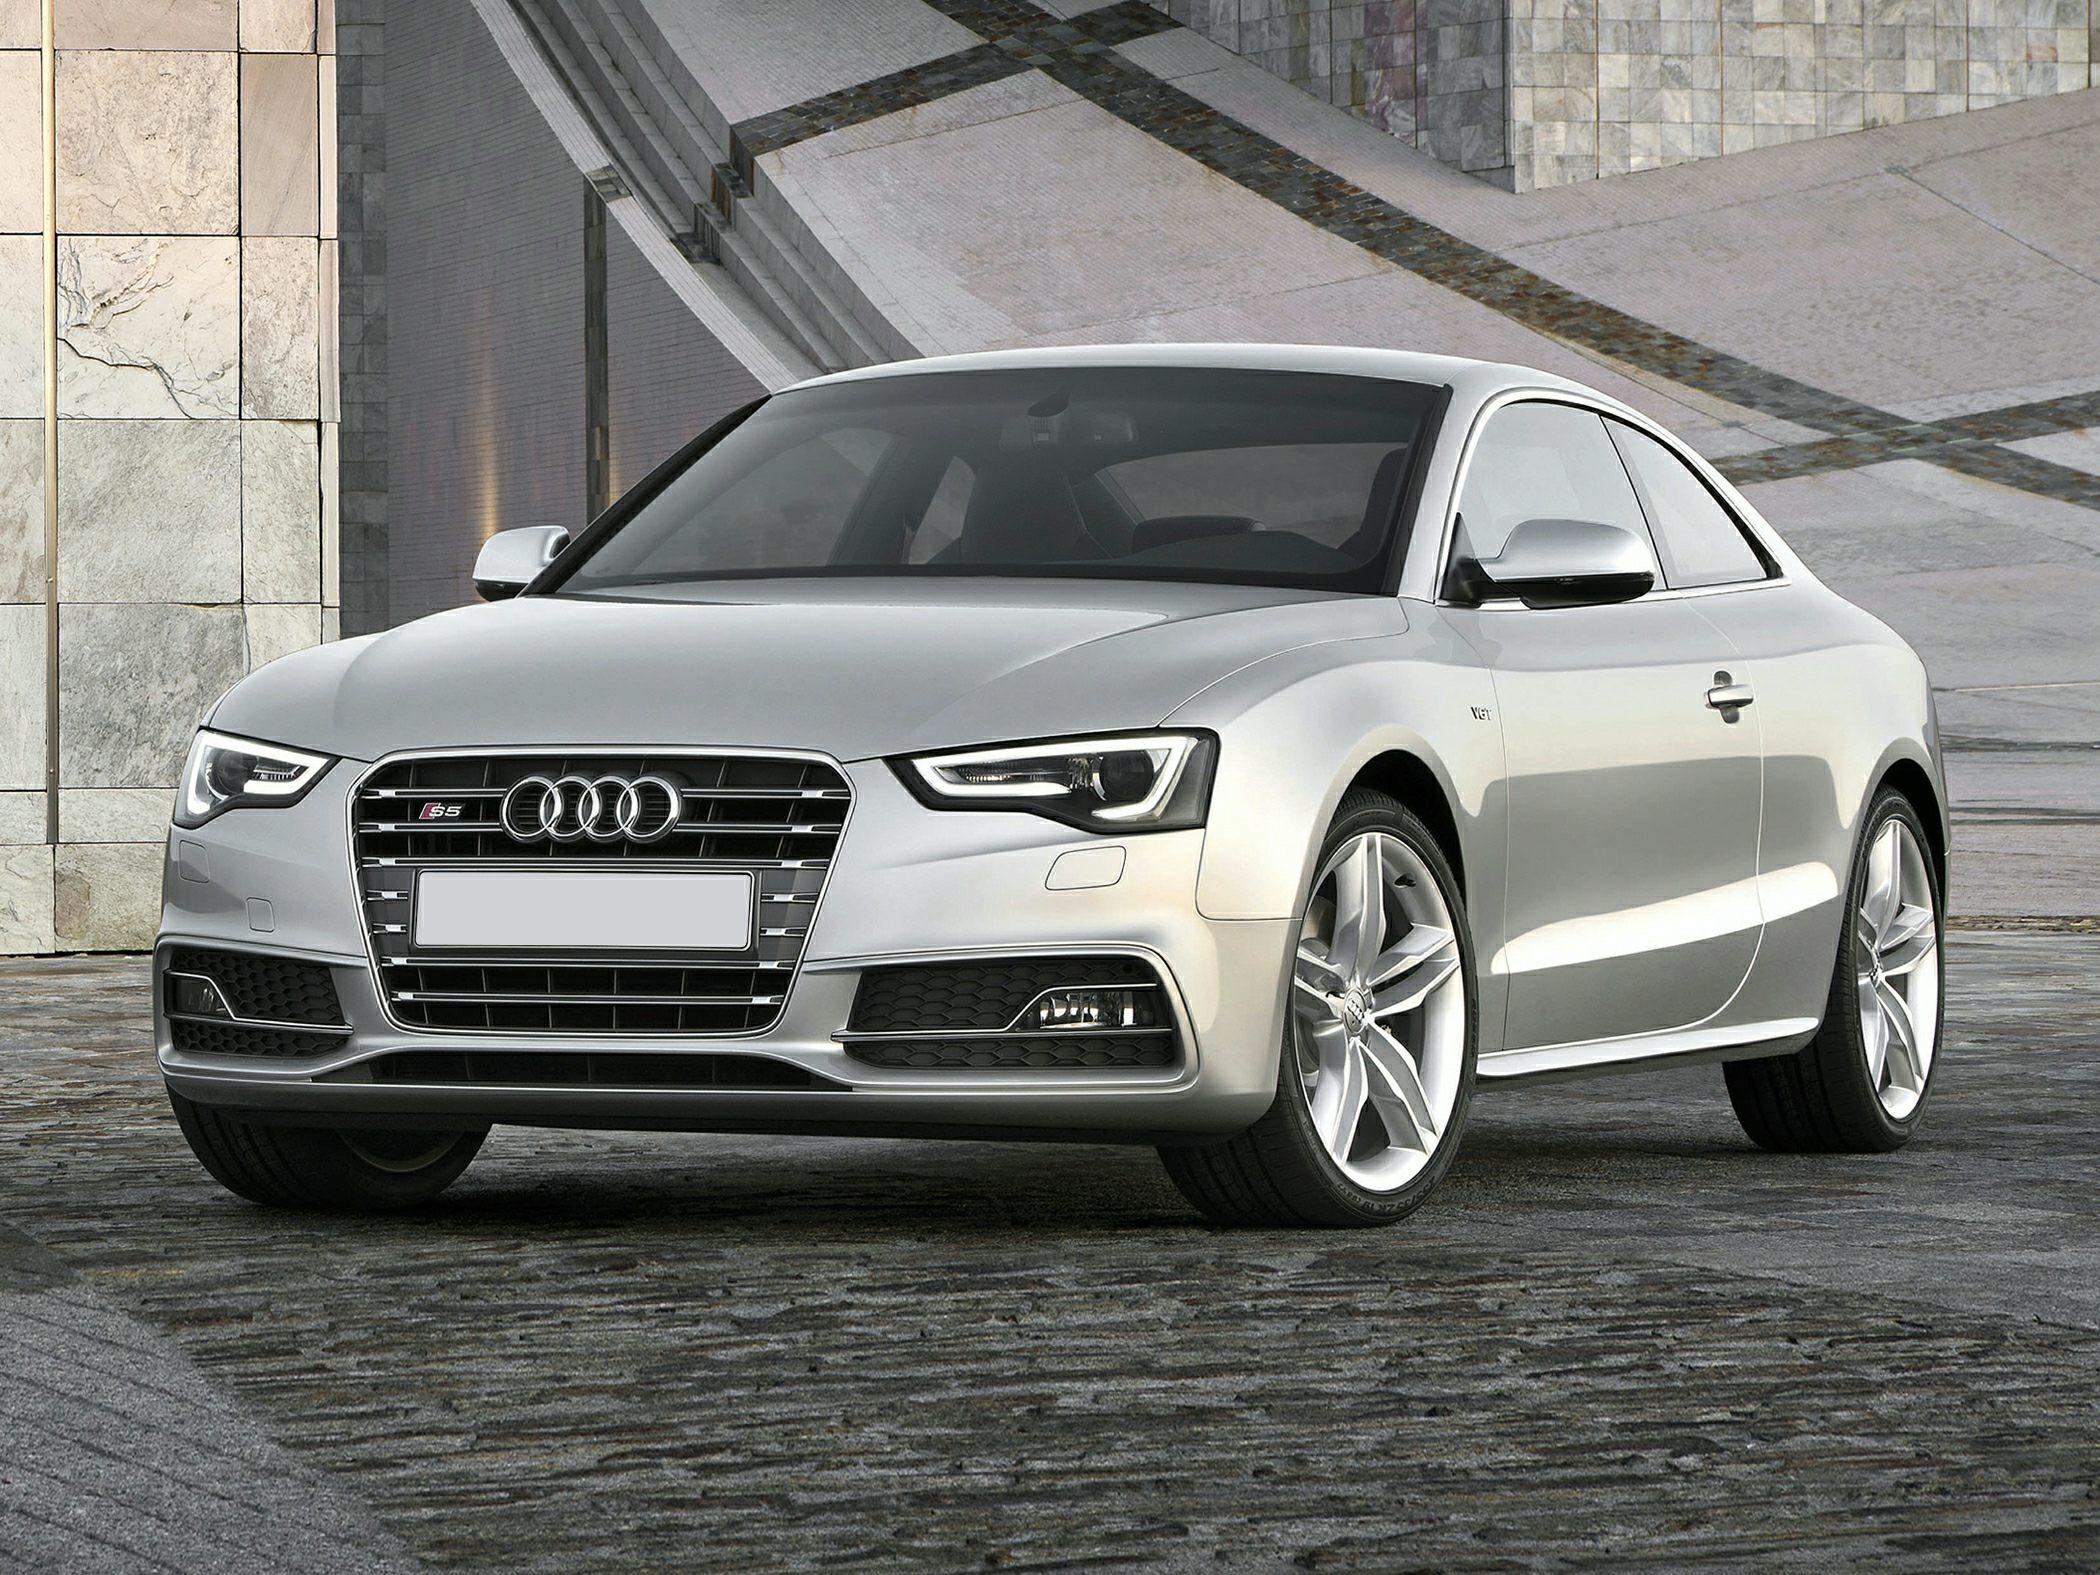 2014 Audi S5 Glam